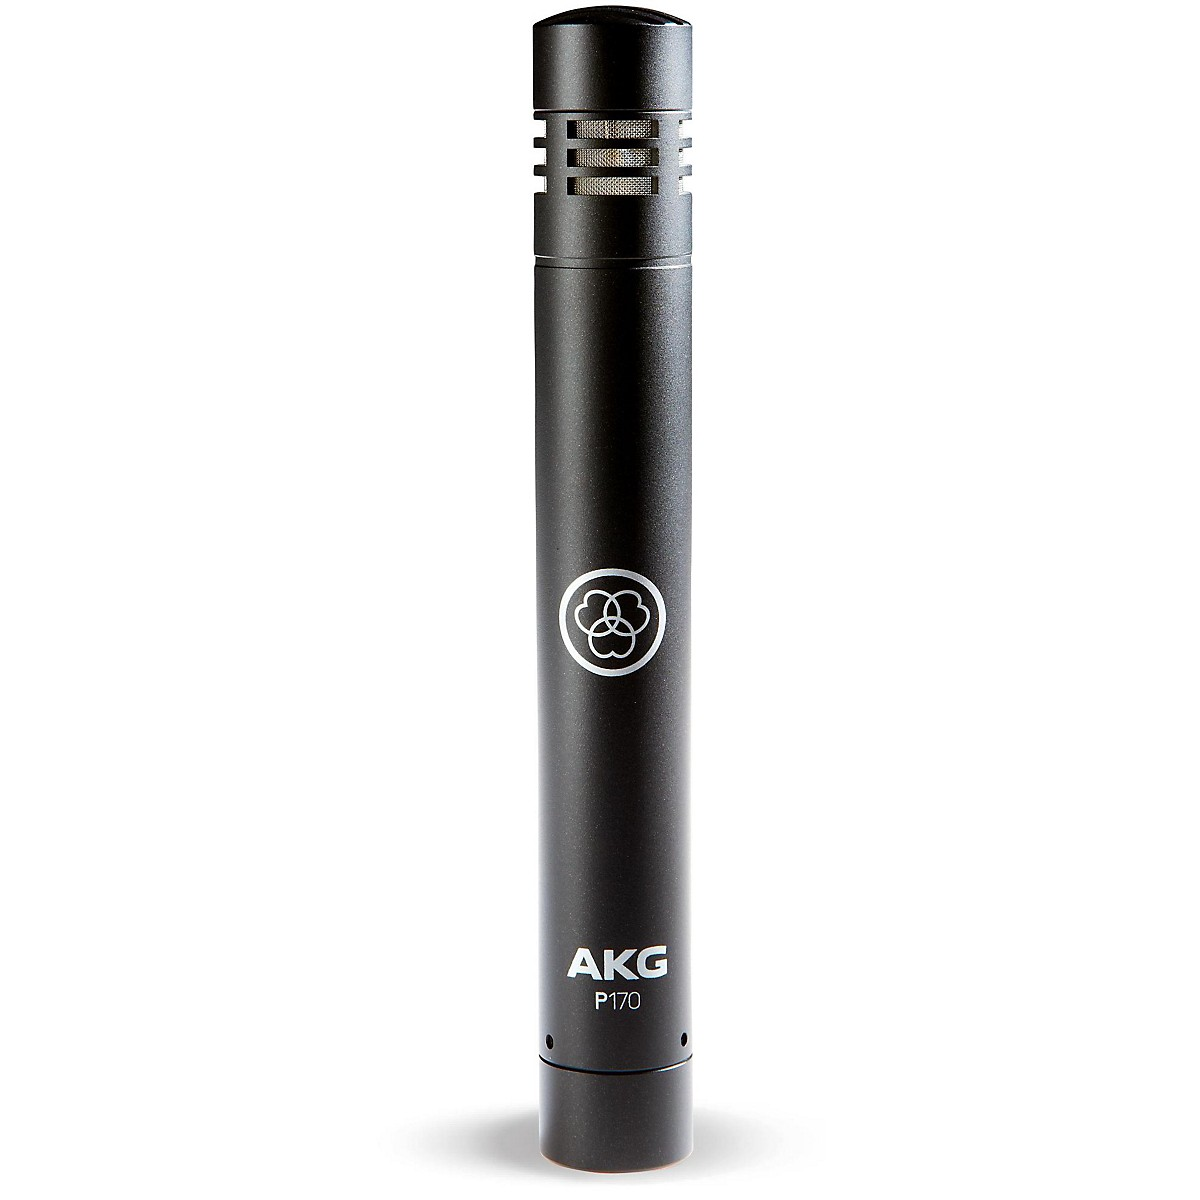 AKG P170 Project Studio Condenser Microphone